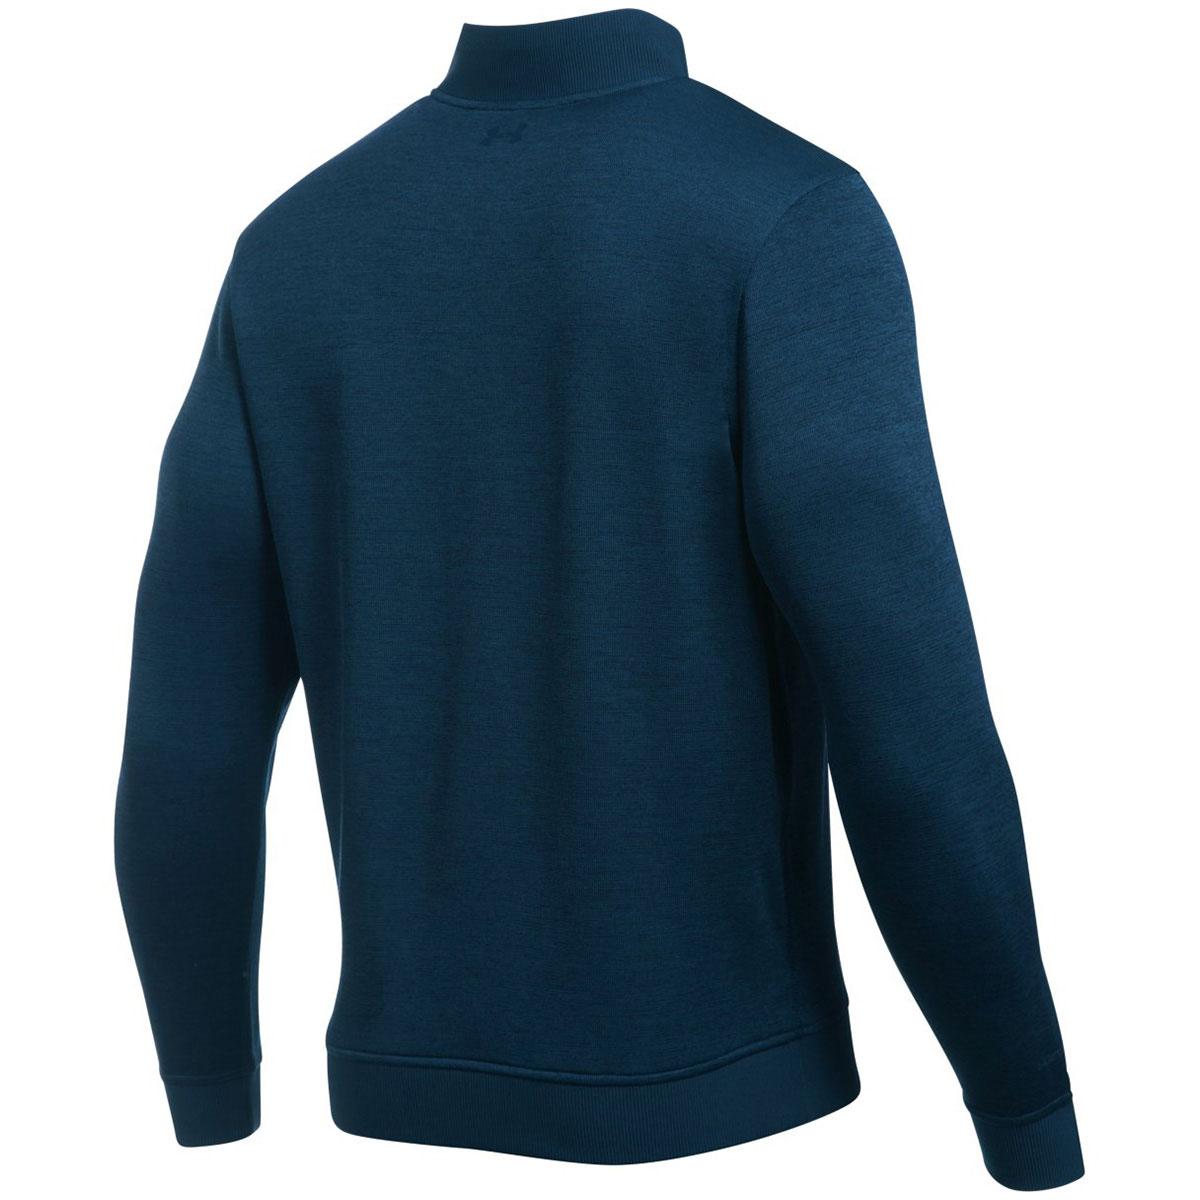 Under-Armour-Mens-UA-Storm-Sweater-Fleece-1-4-Zip-Pullover-Jumper-25-OFF-RRP thumbnail 3